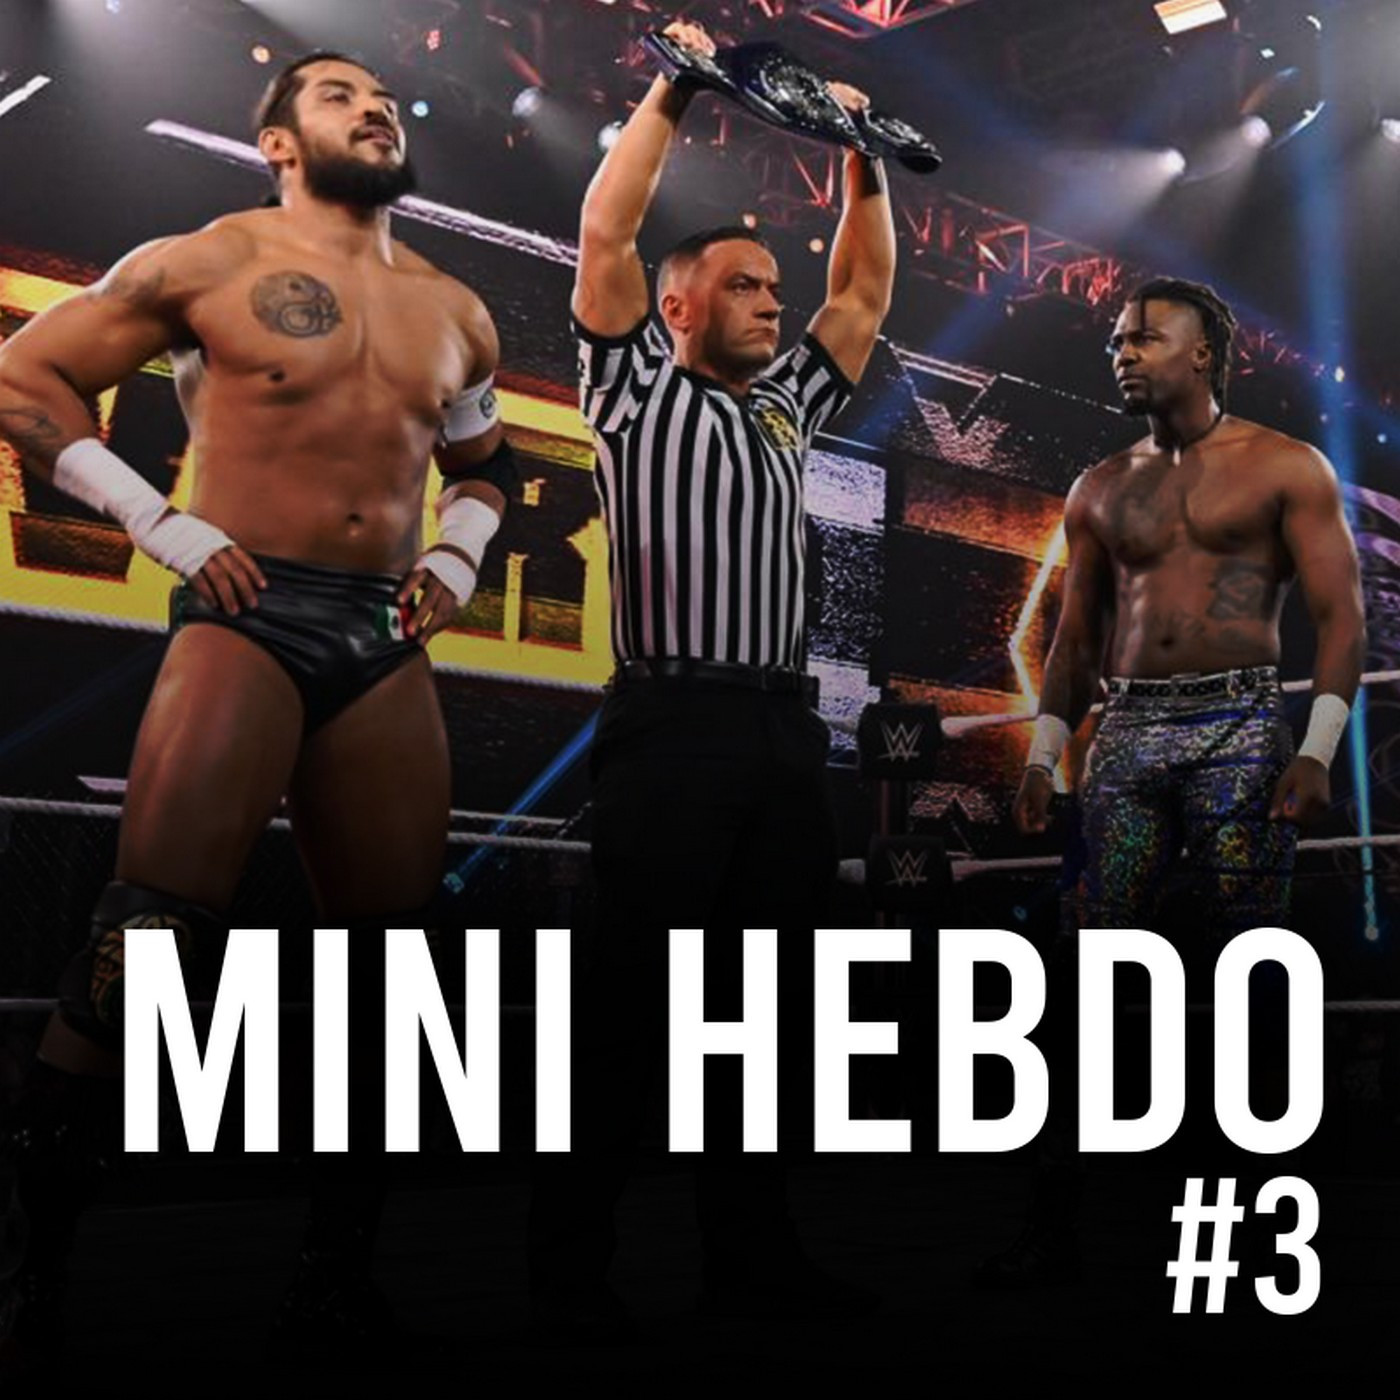 Les Rebuts du Catch : MiniHebdo #3 : Review NXT TAKEOVER 31